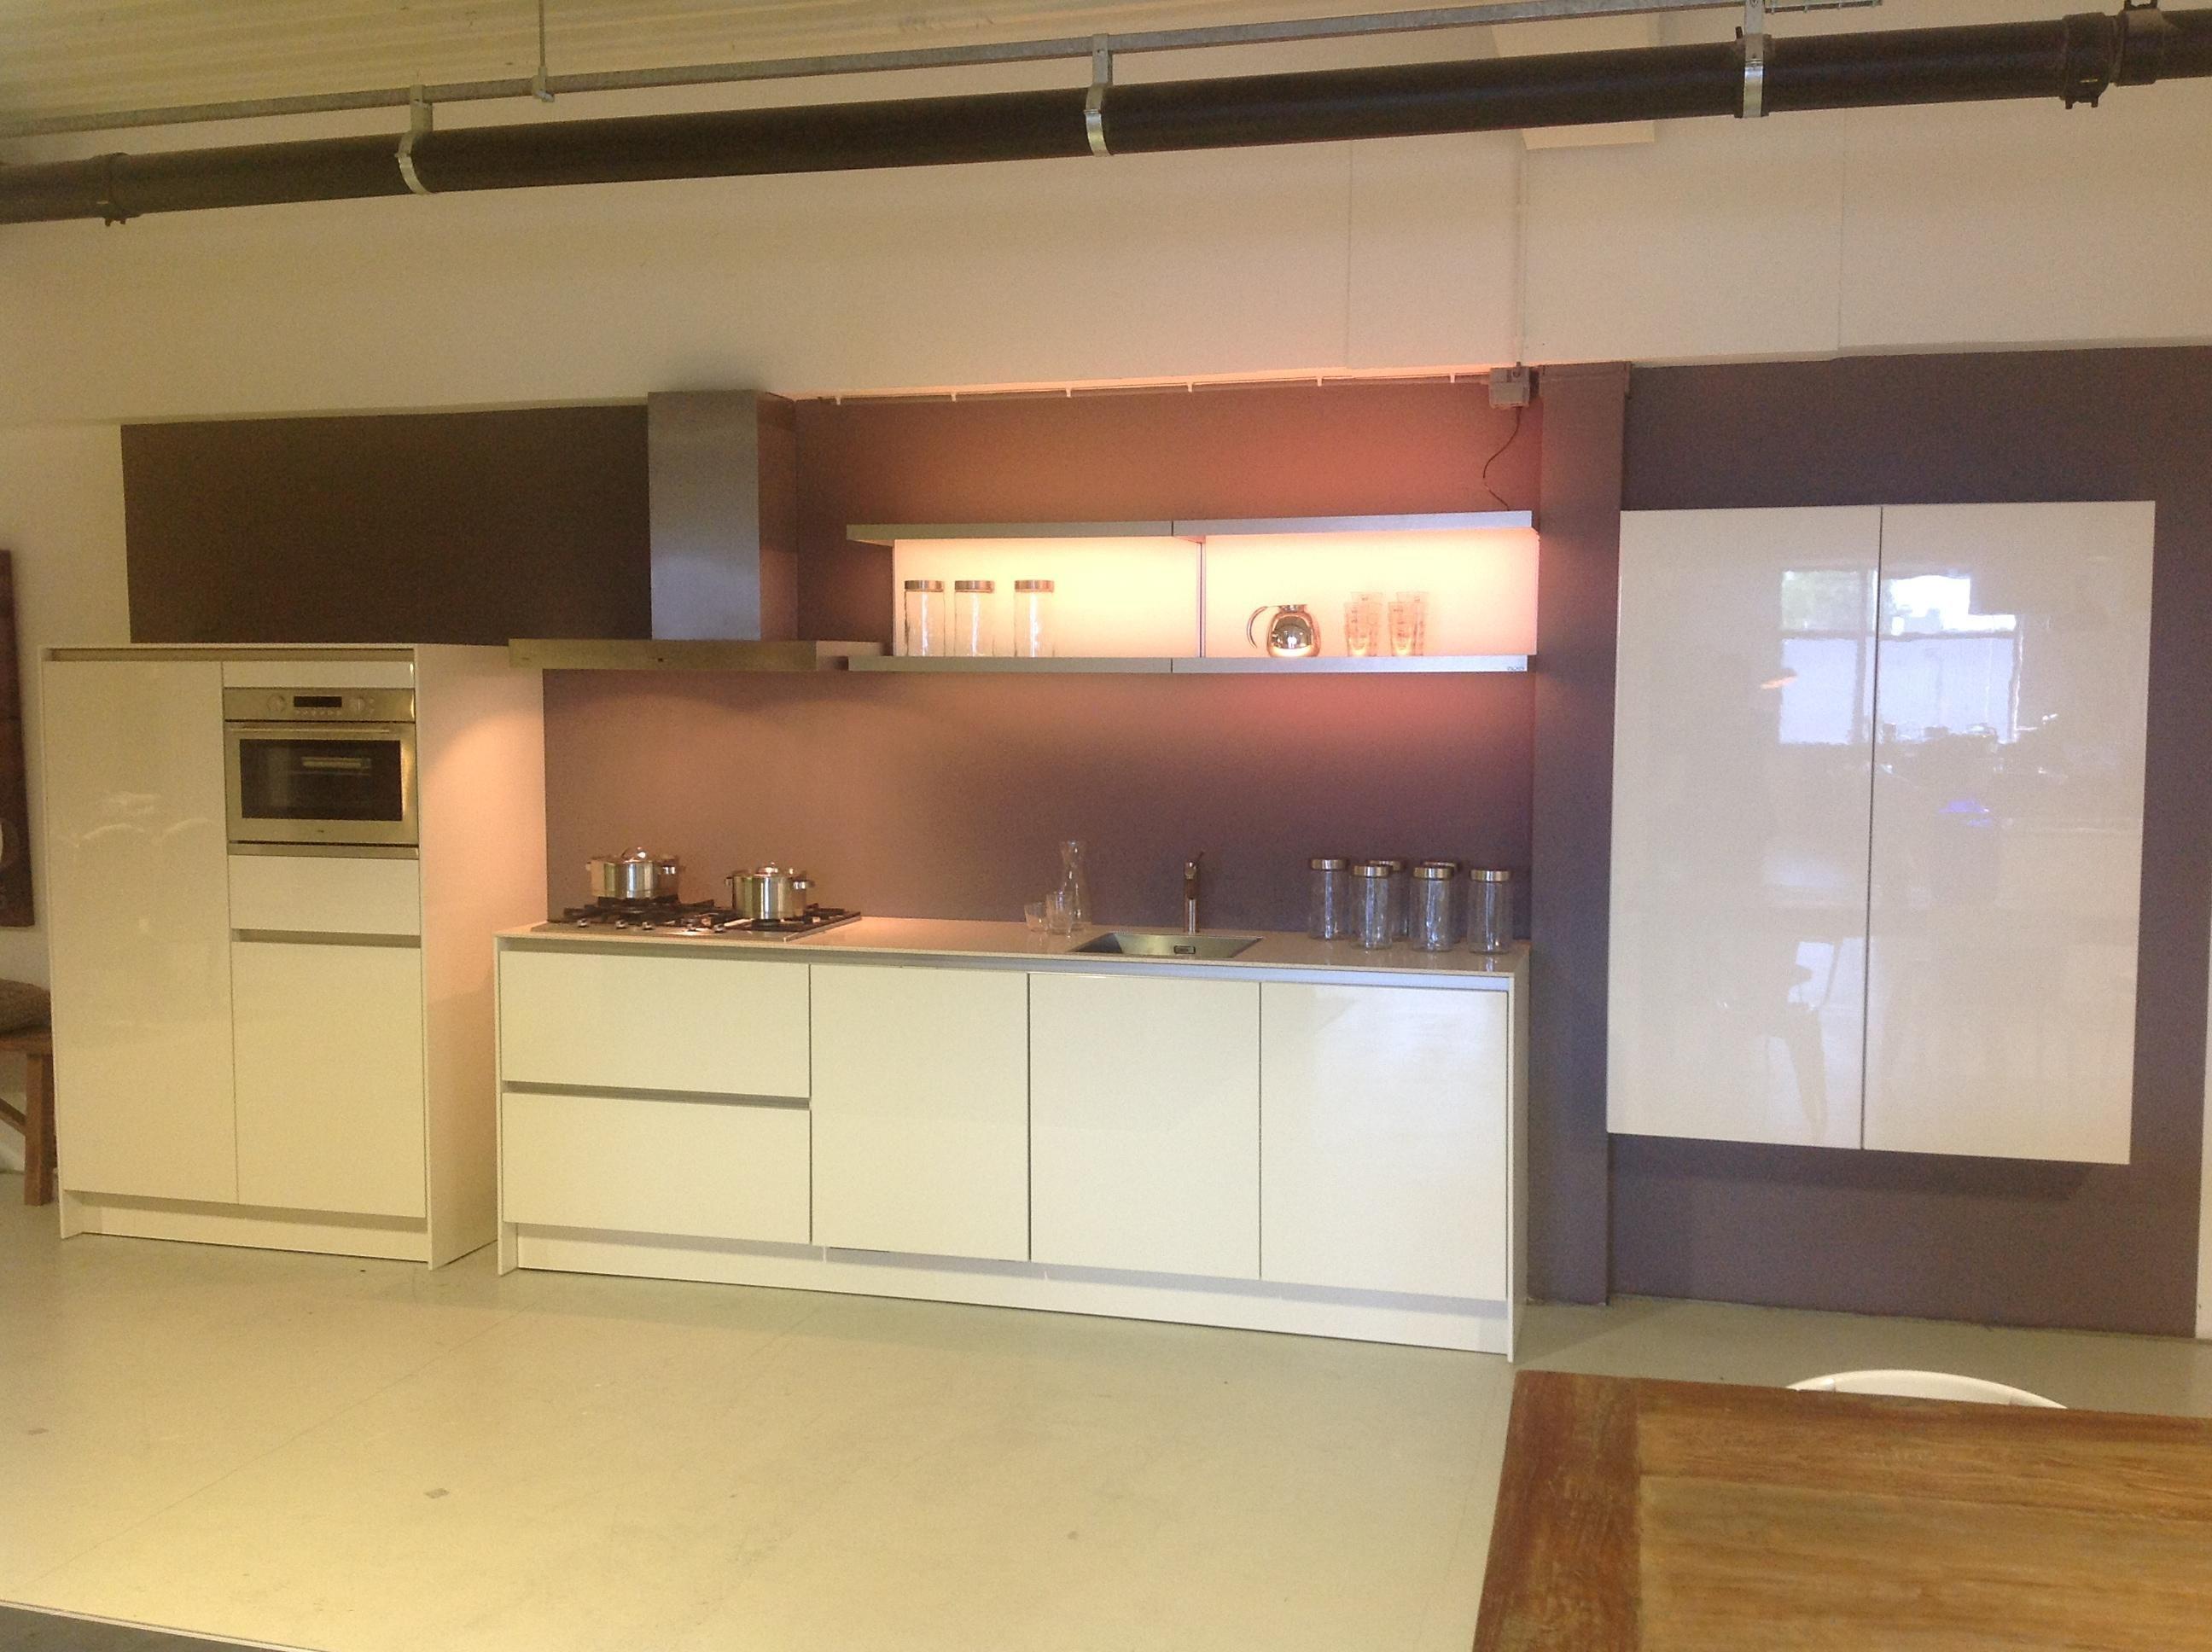 Ontwerp keukenkast lage - Centrale eiland prijzen ...